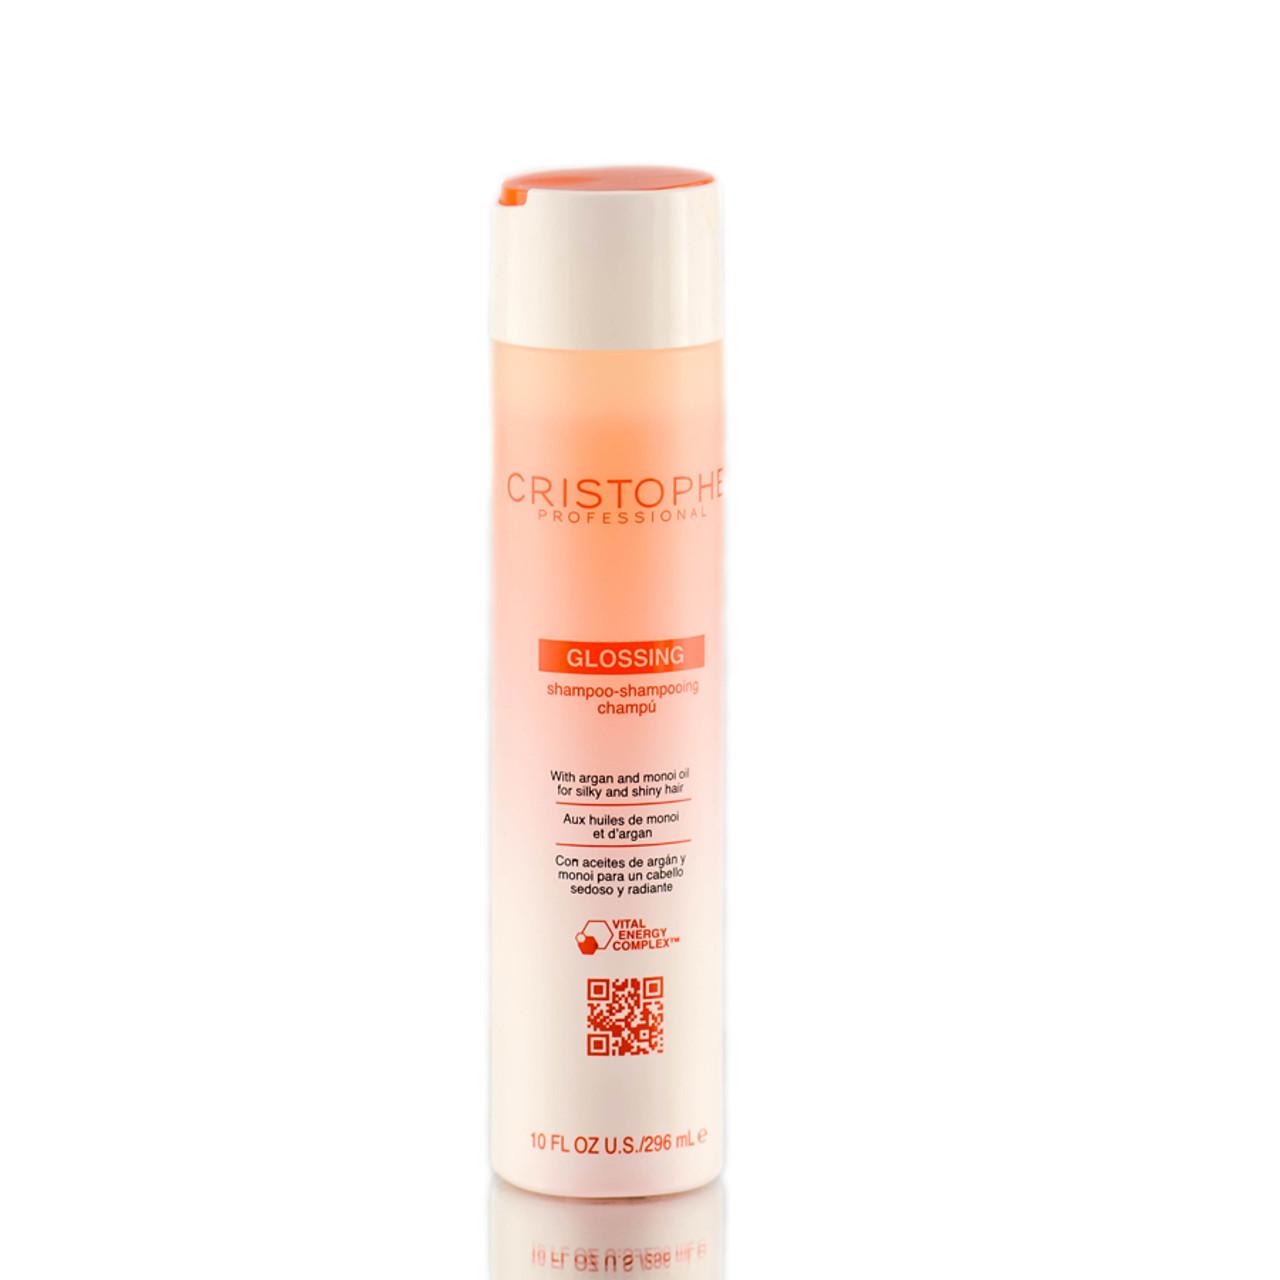 Cristophe professional glossing shampoo for Cristophe salon prices